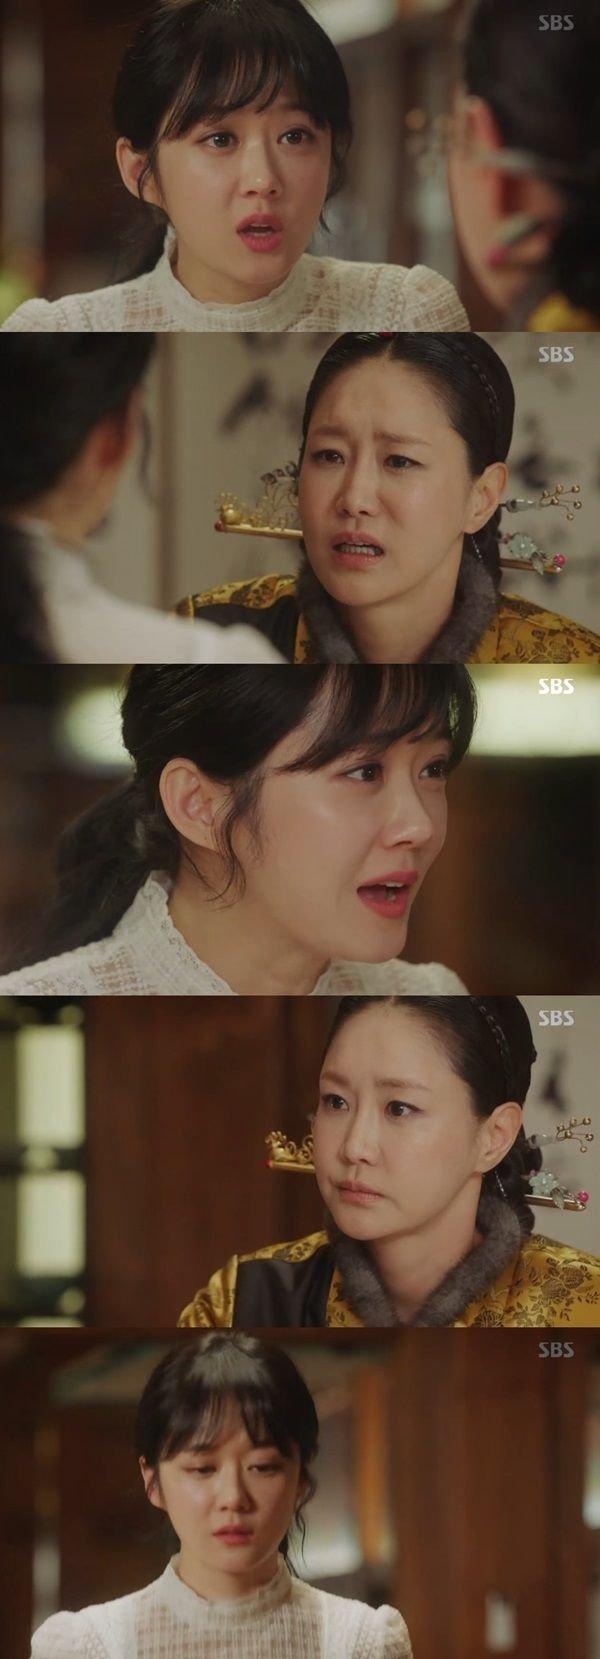 Drama 2018-2019] Empress Dignity / The Last Empress, 황후의